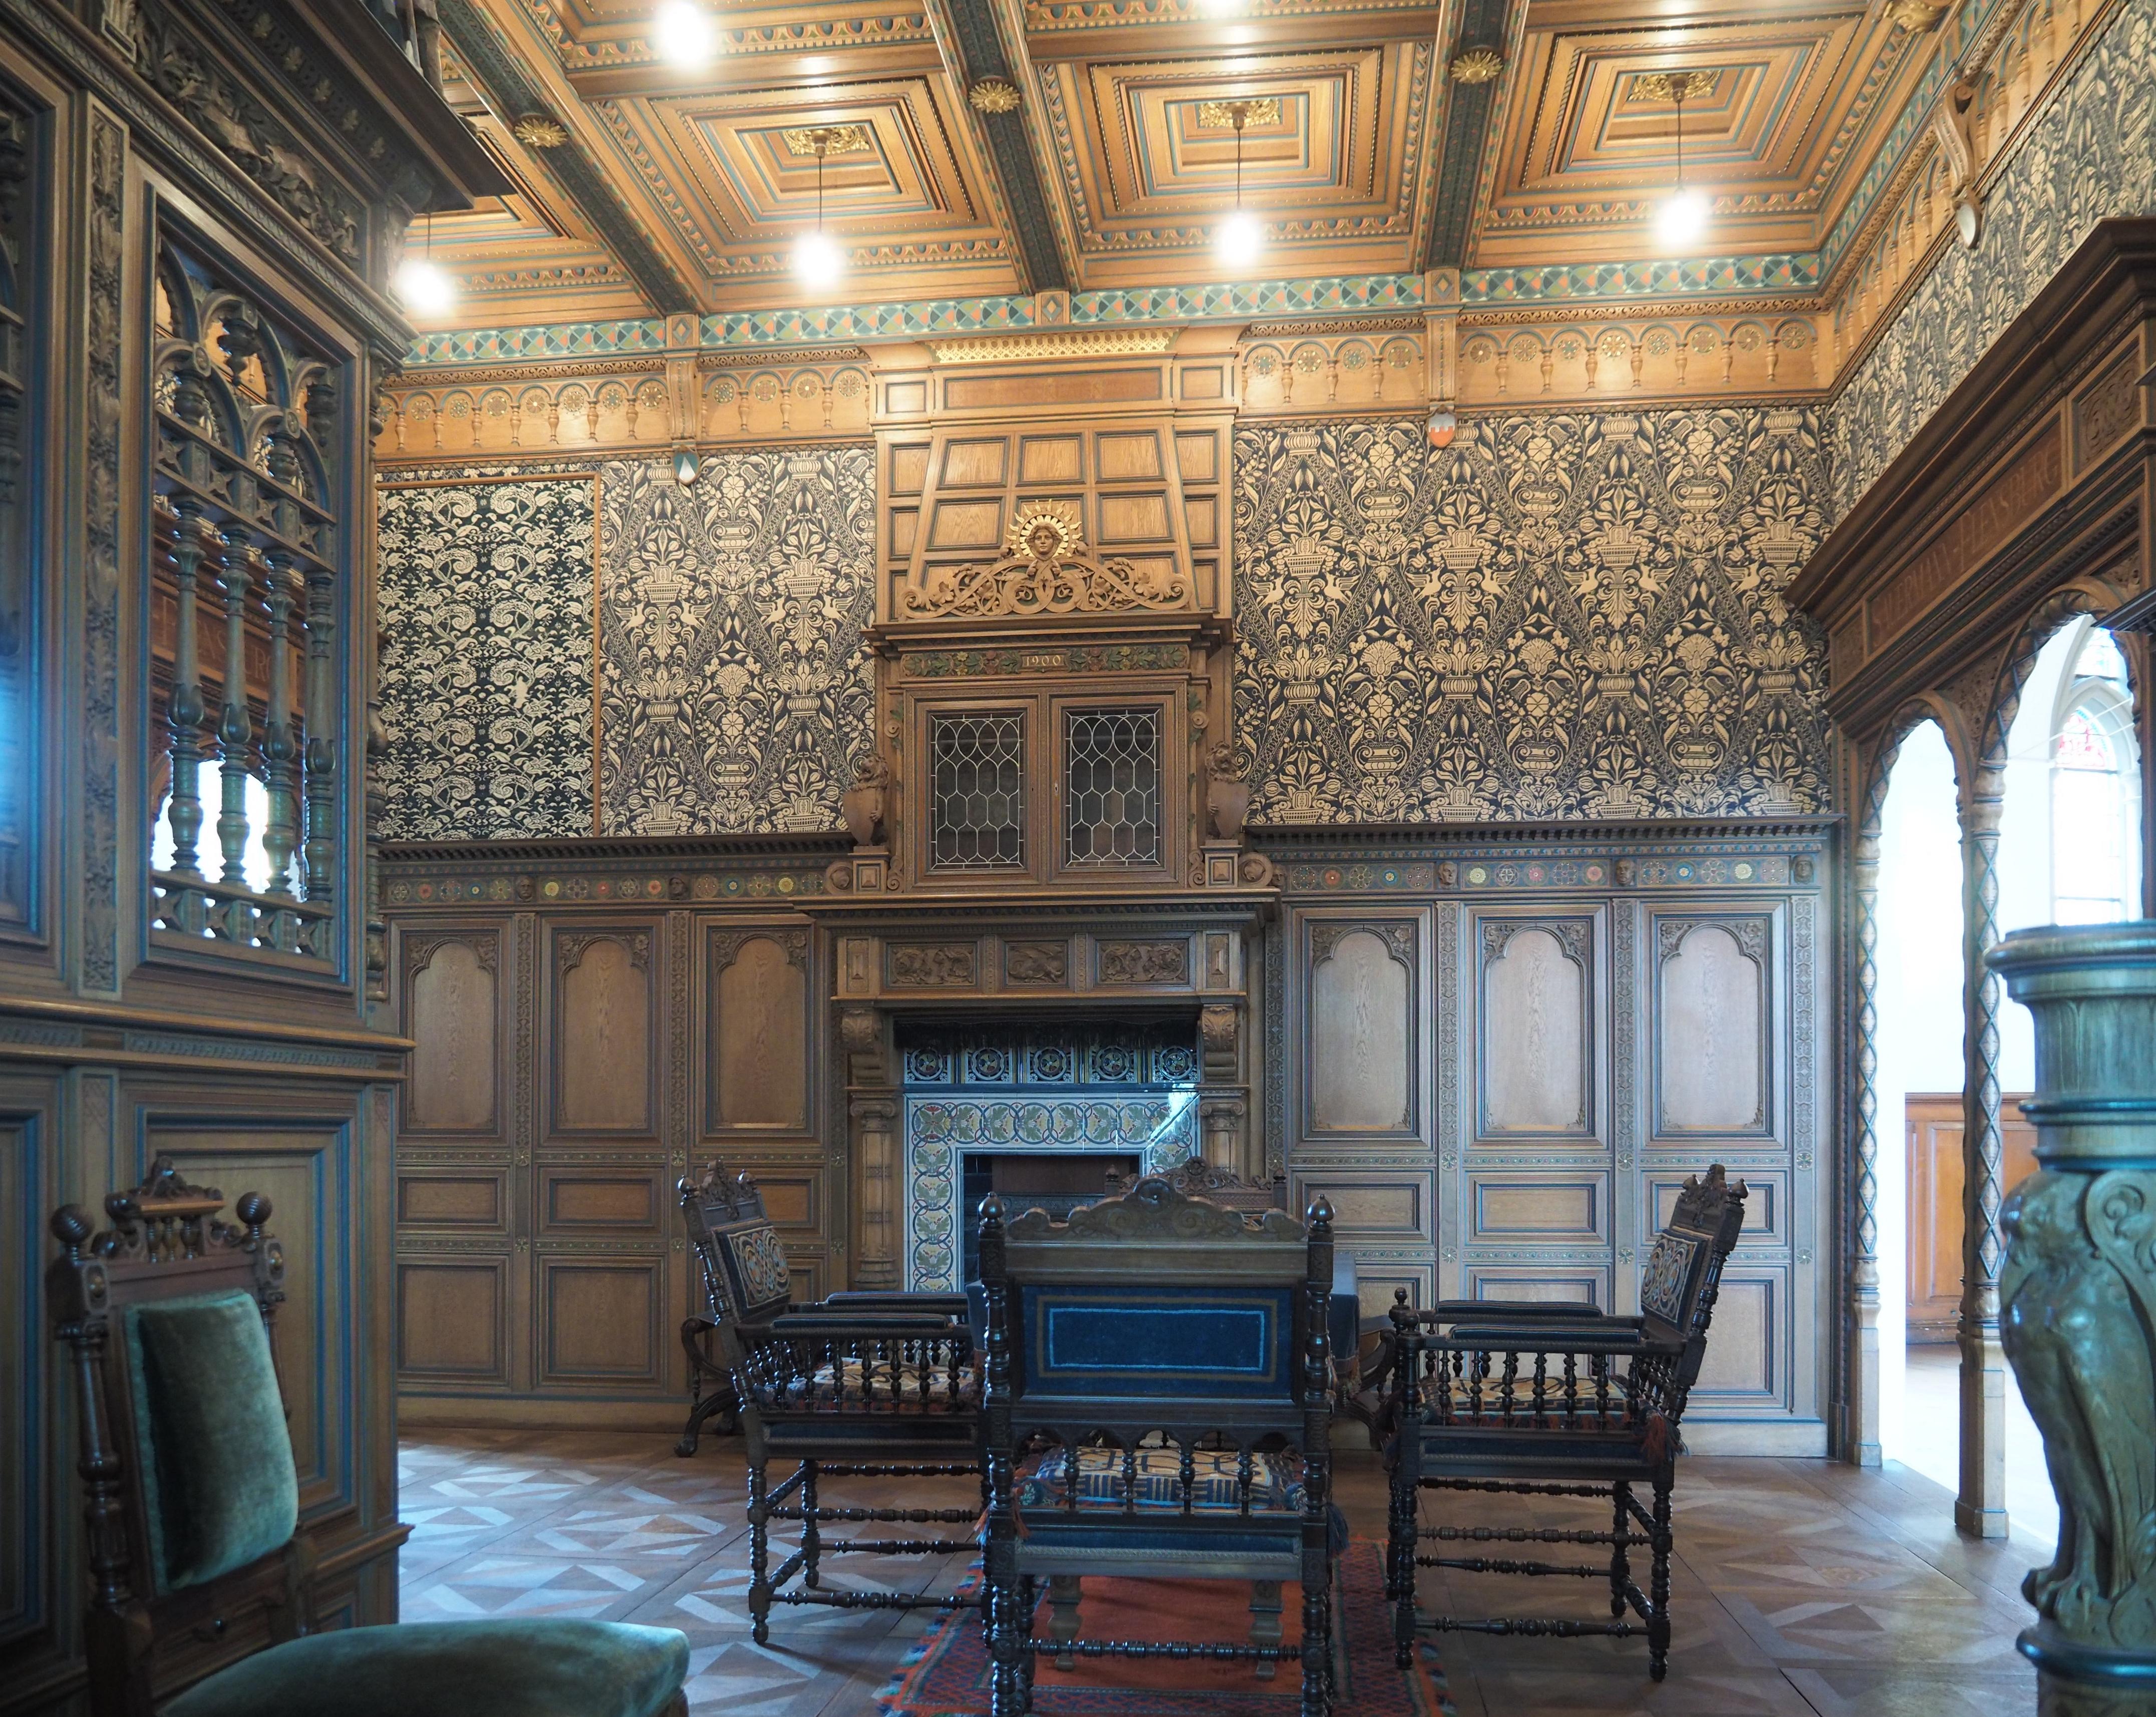 File:Museumsberg Flensburg Hans-Christansen-Haus 49.JPG - Wikimedia ...